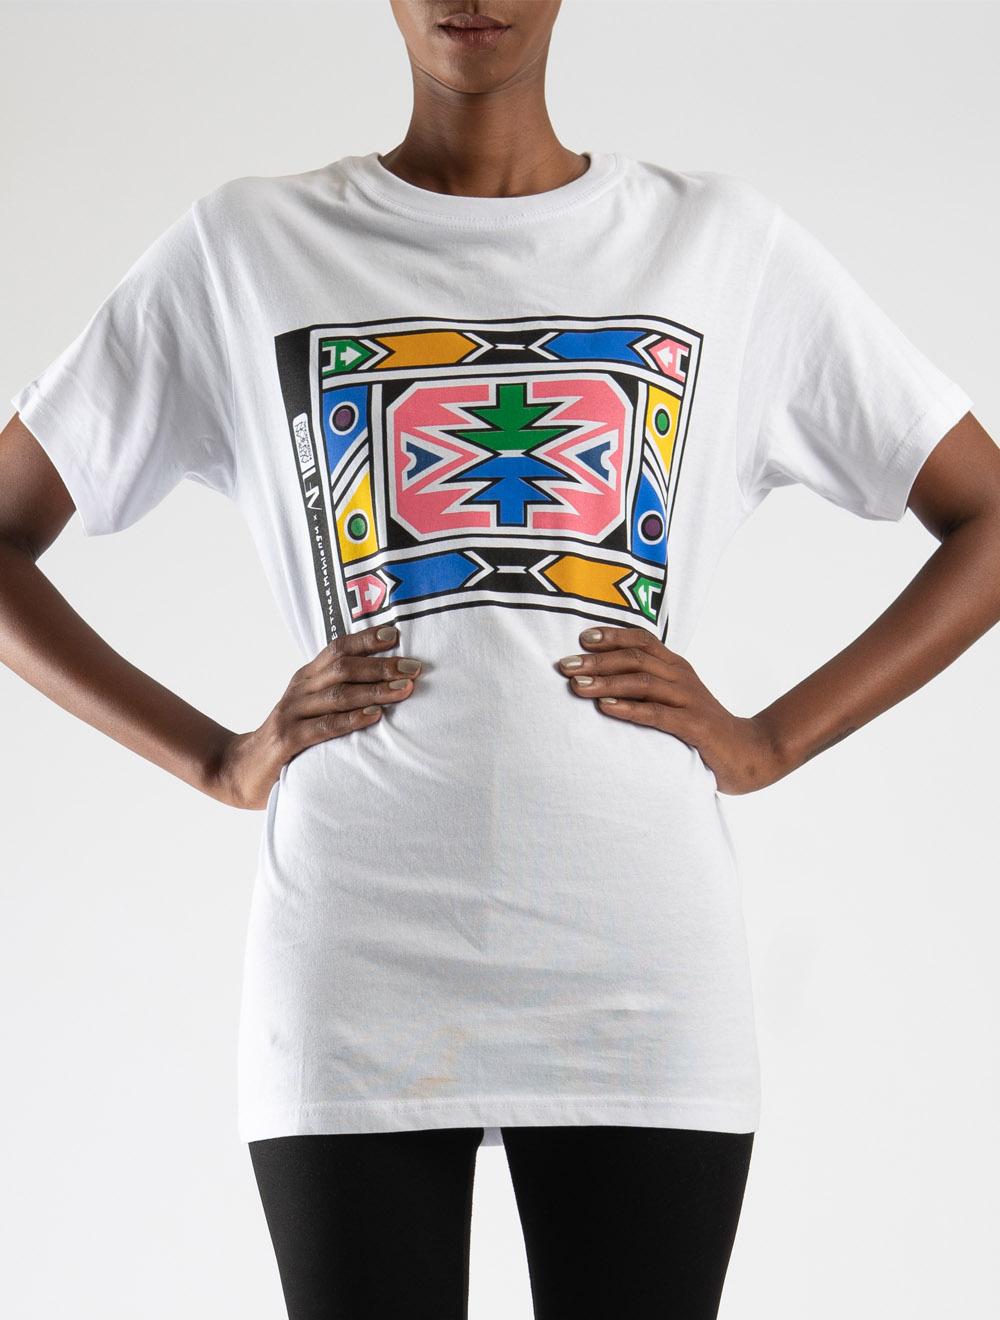 Esther Mahlangu t-shirt – Front B